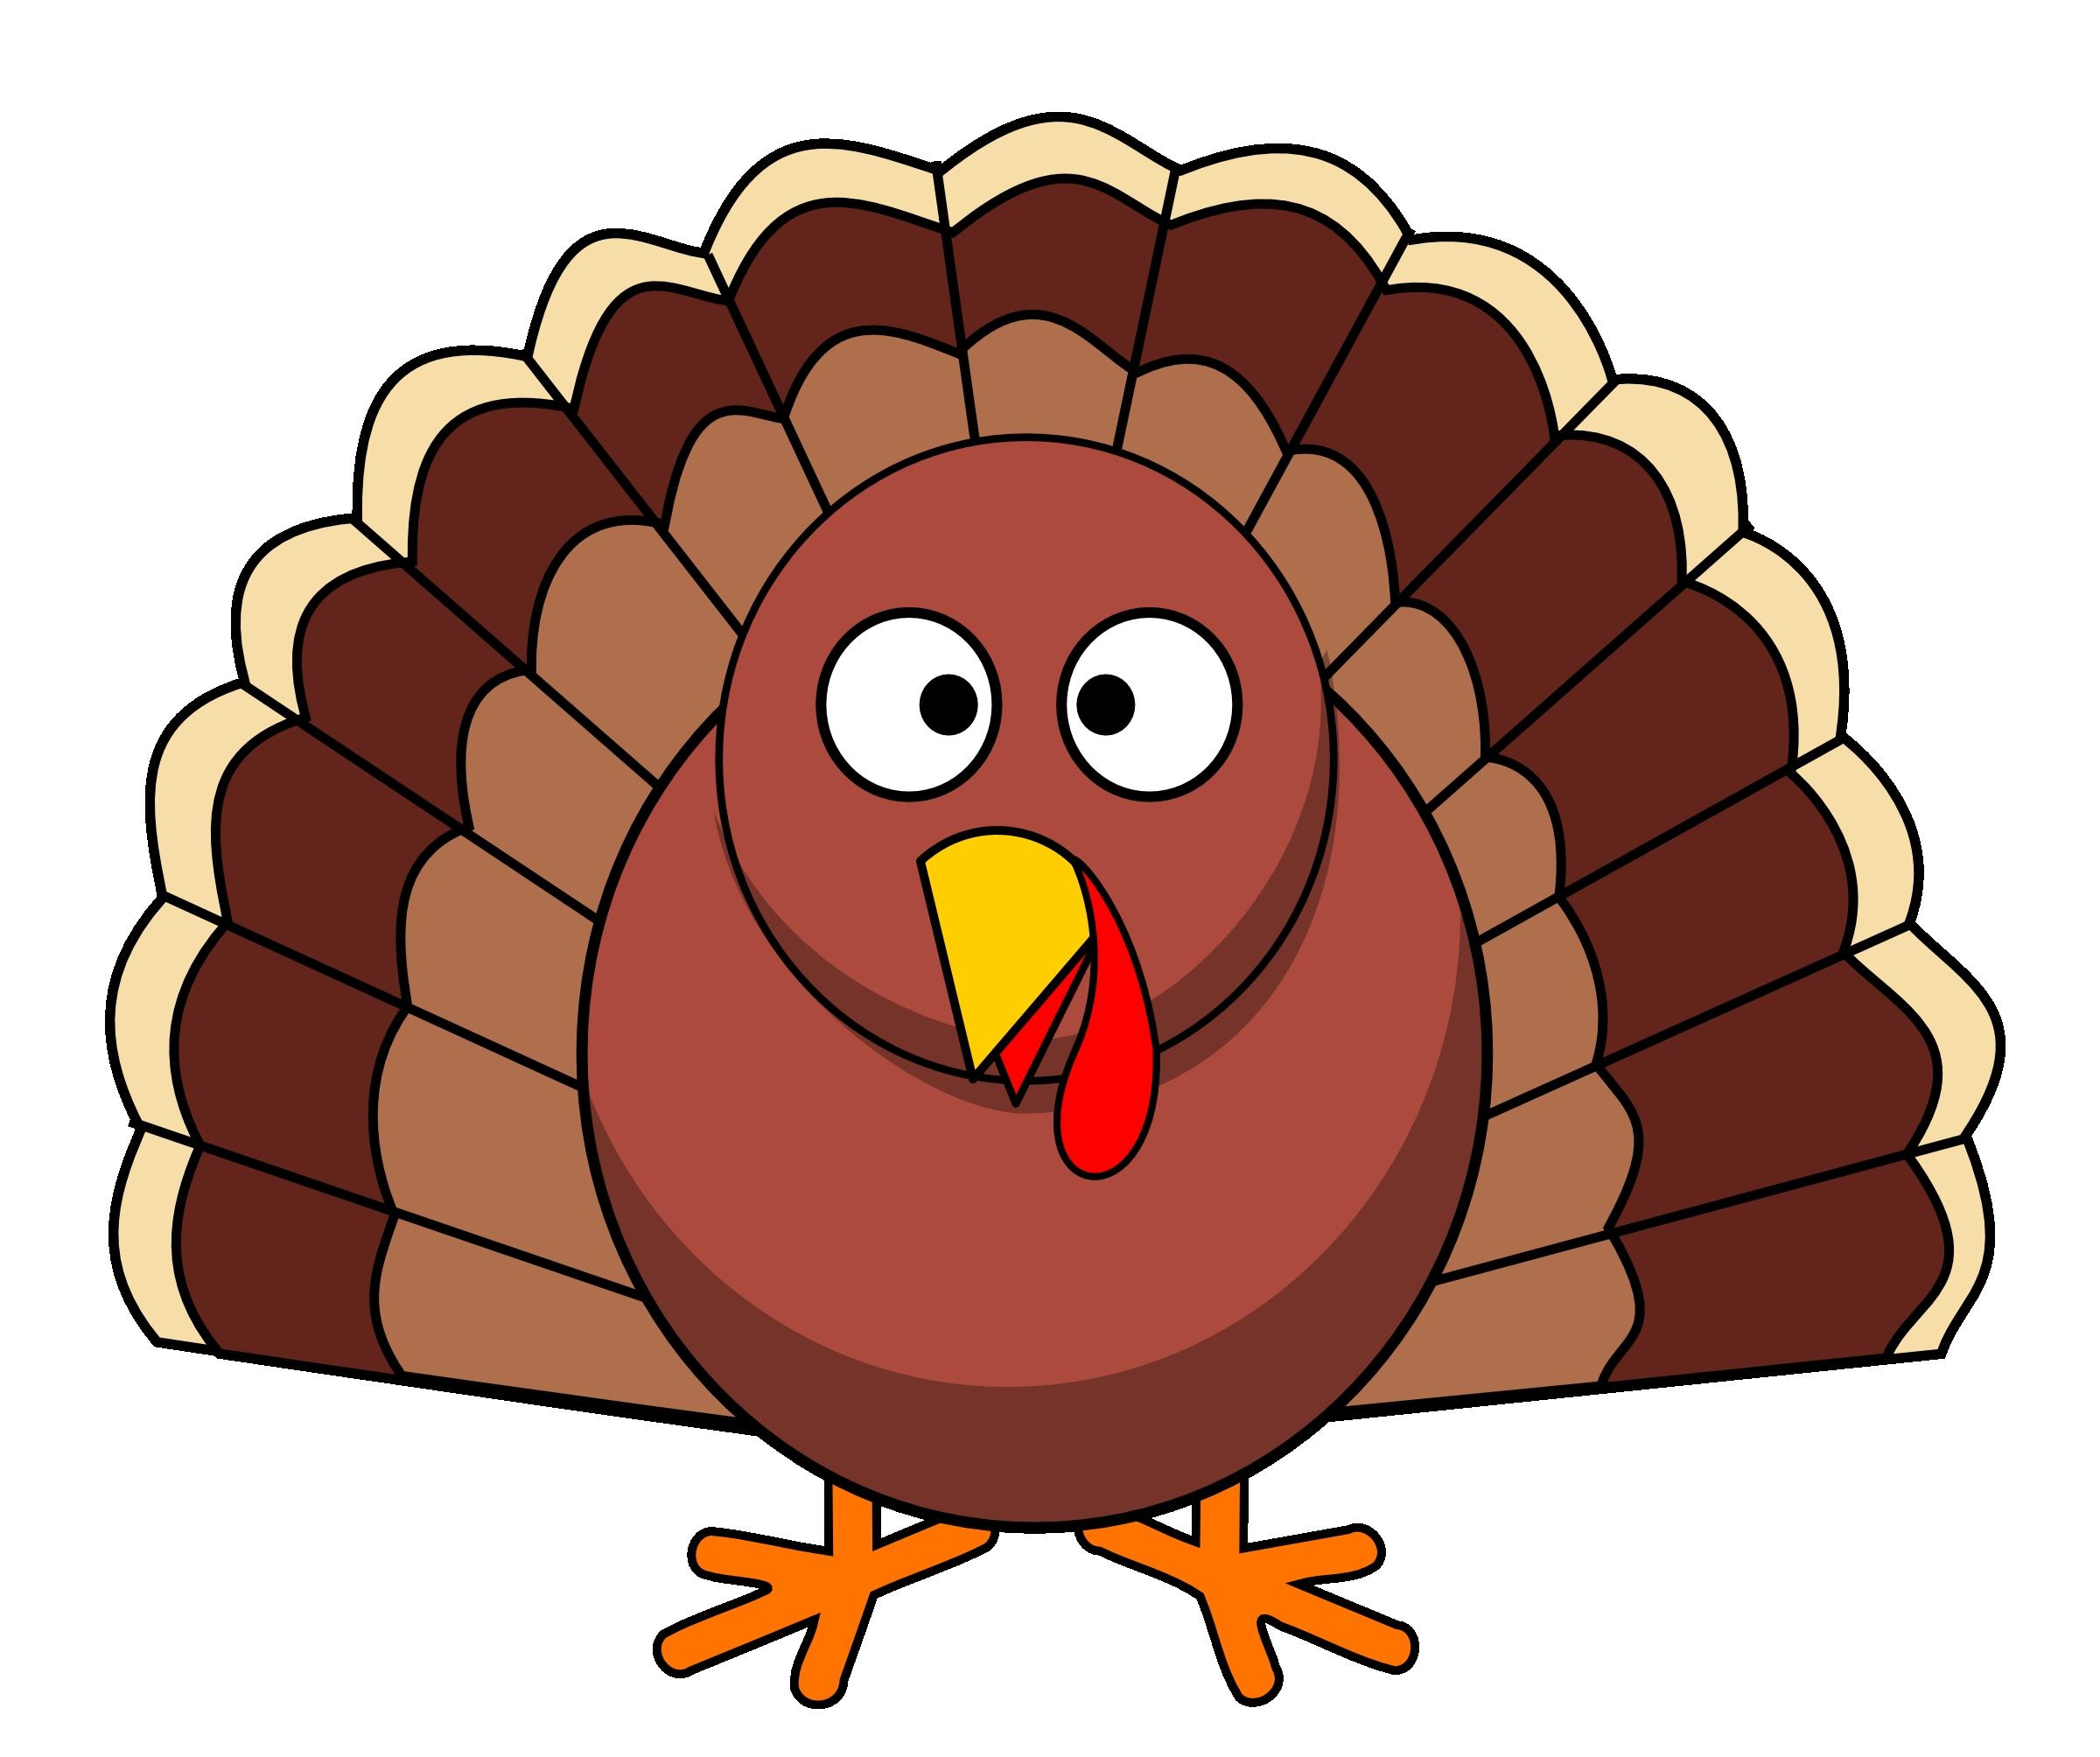 2400x2008 Unique Thanksgiving Turkey Cartoon Images Design Free Cartoon